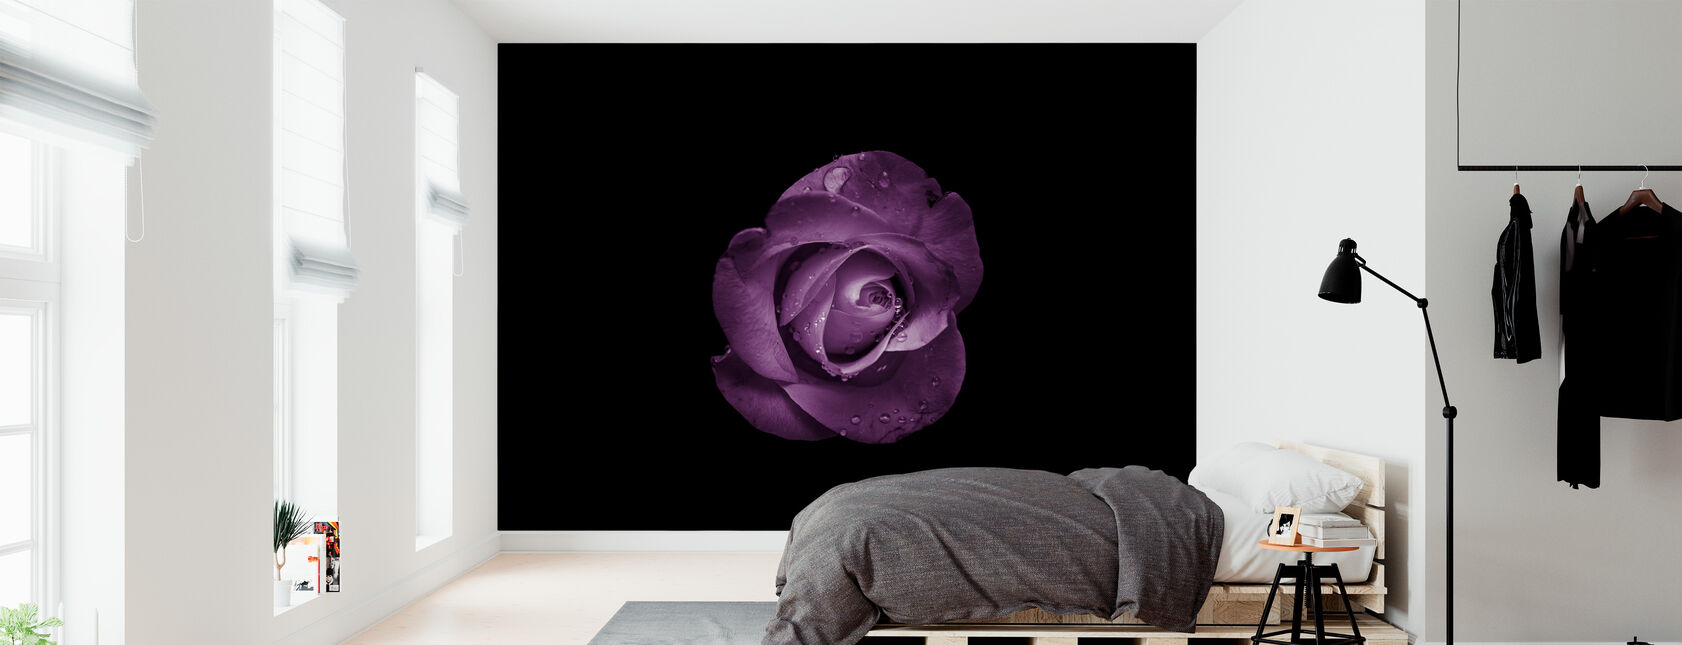 Bloem met Waterdruppels - Behang - Slaapkamer